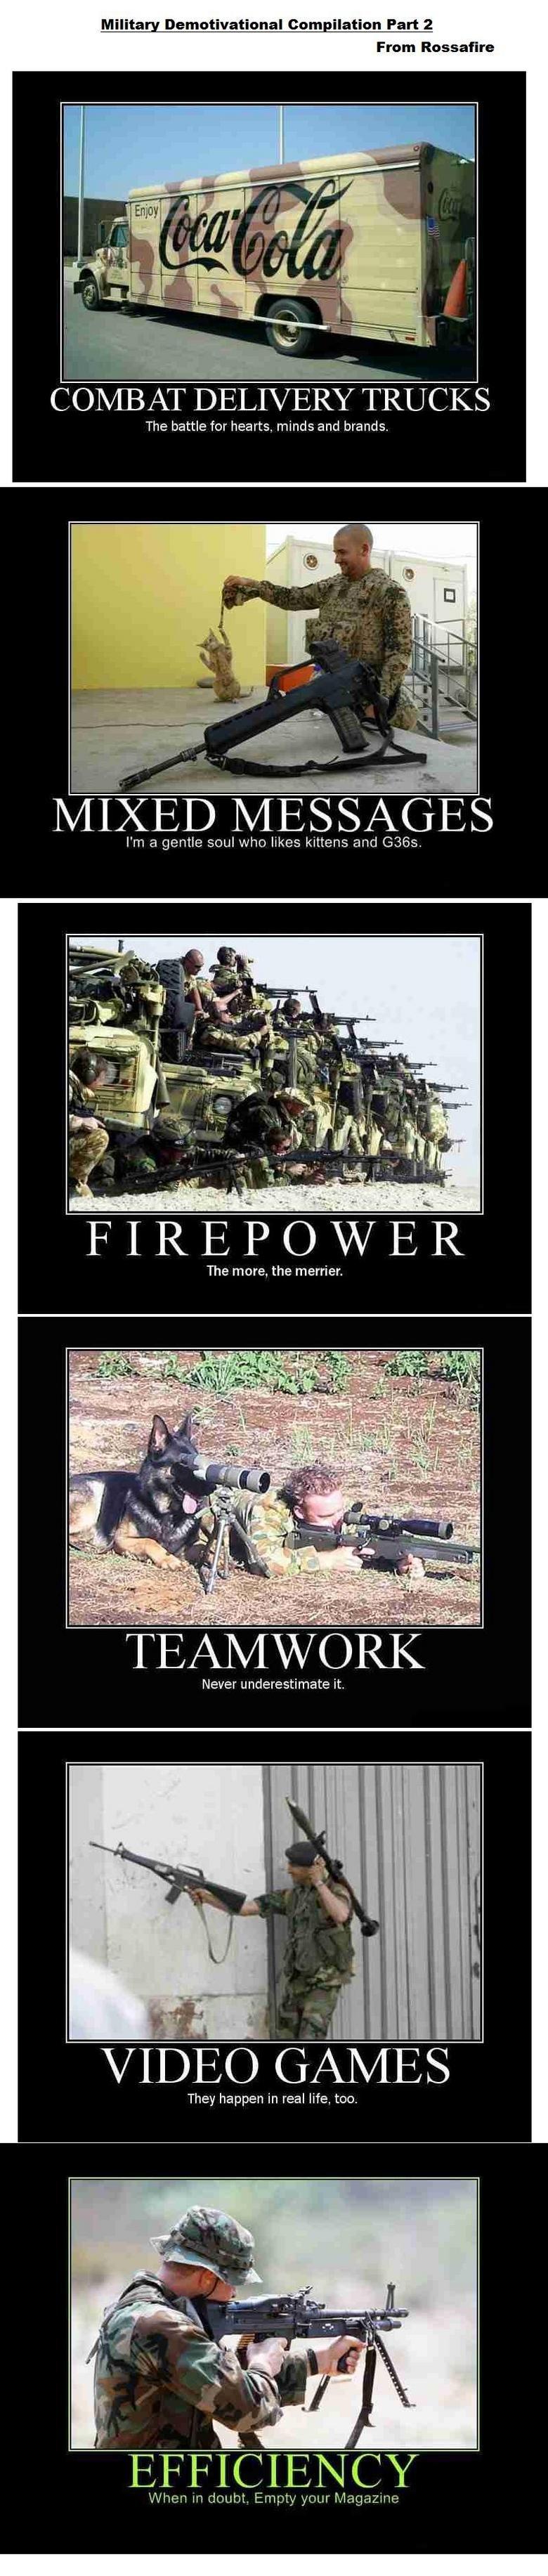 Military Demotivational Compilation 2. More military demotivators<br /> Part 1: /funny_pictures/714394/Military+Demotivational+Compilation/<br /> Sp Military